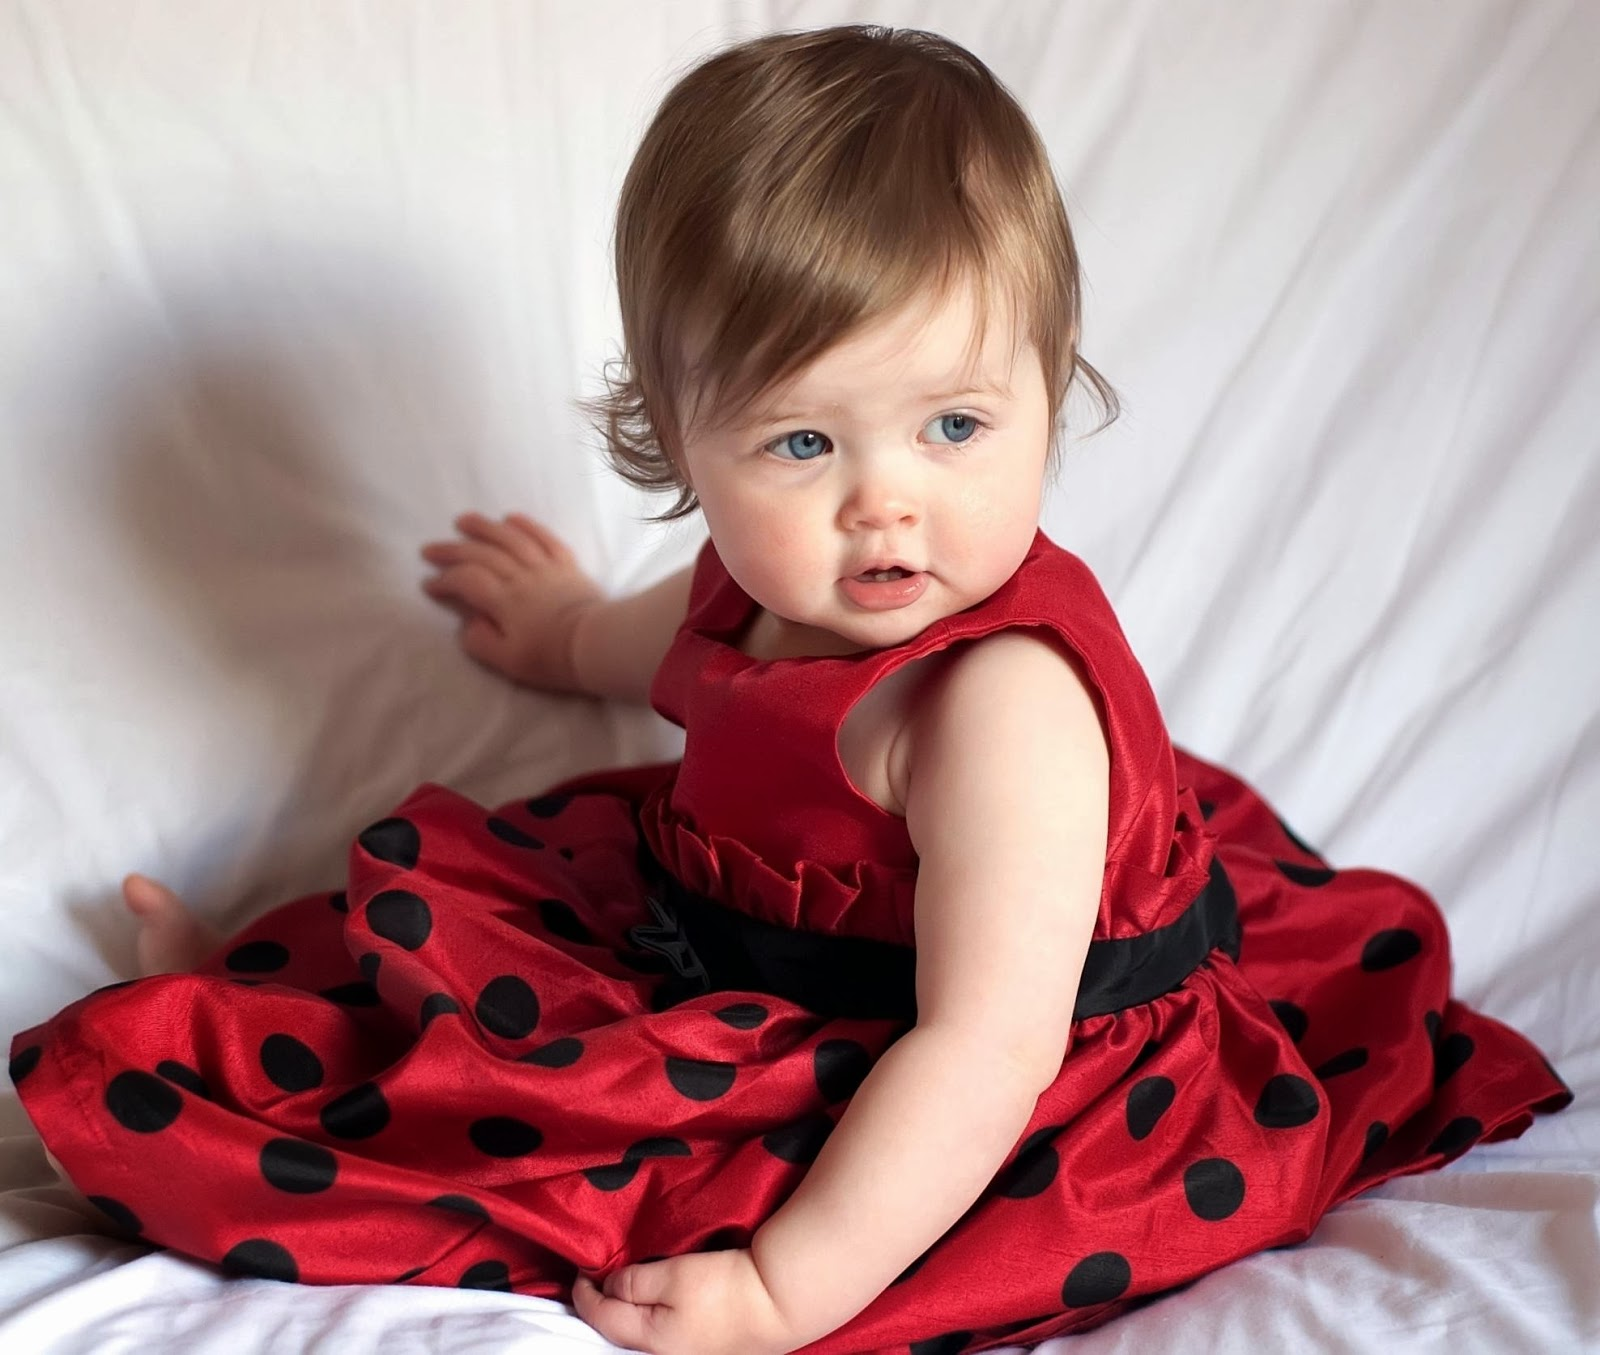 Baby cool girl photo foto